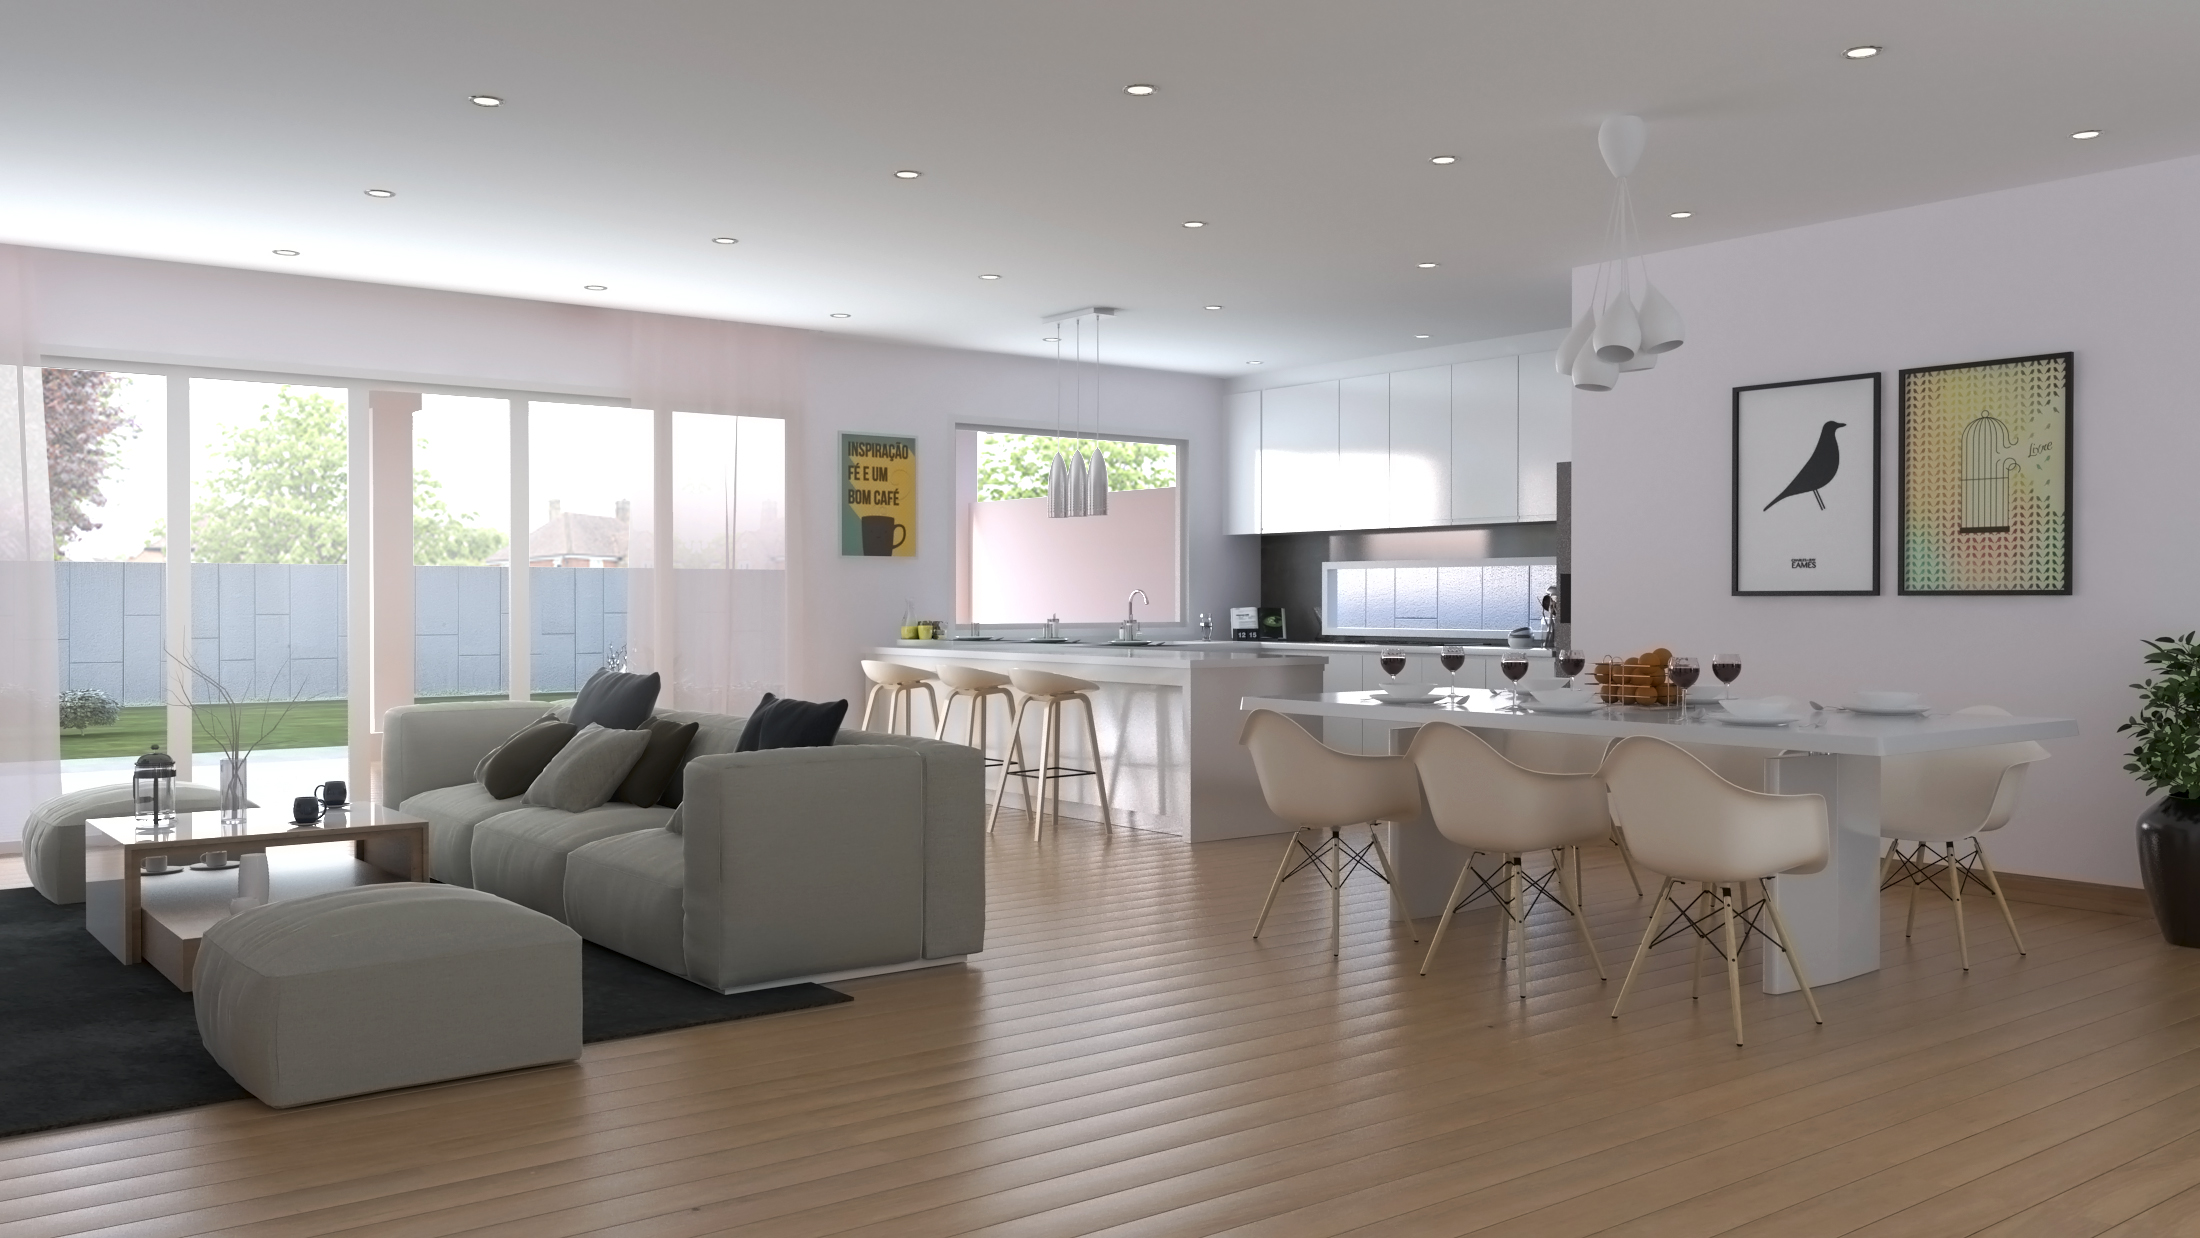 Interior_Final_View_HD.jpg